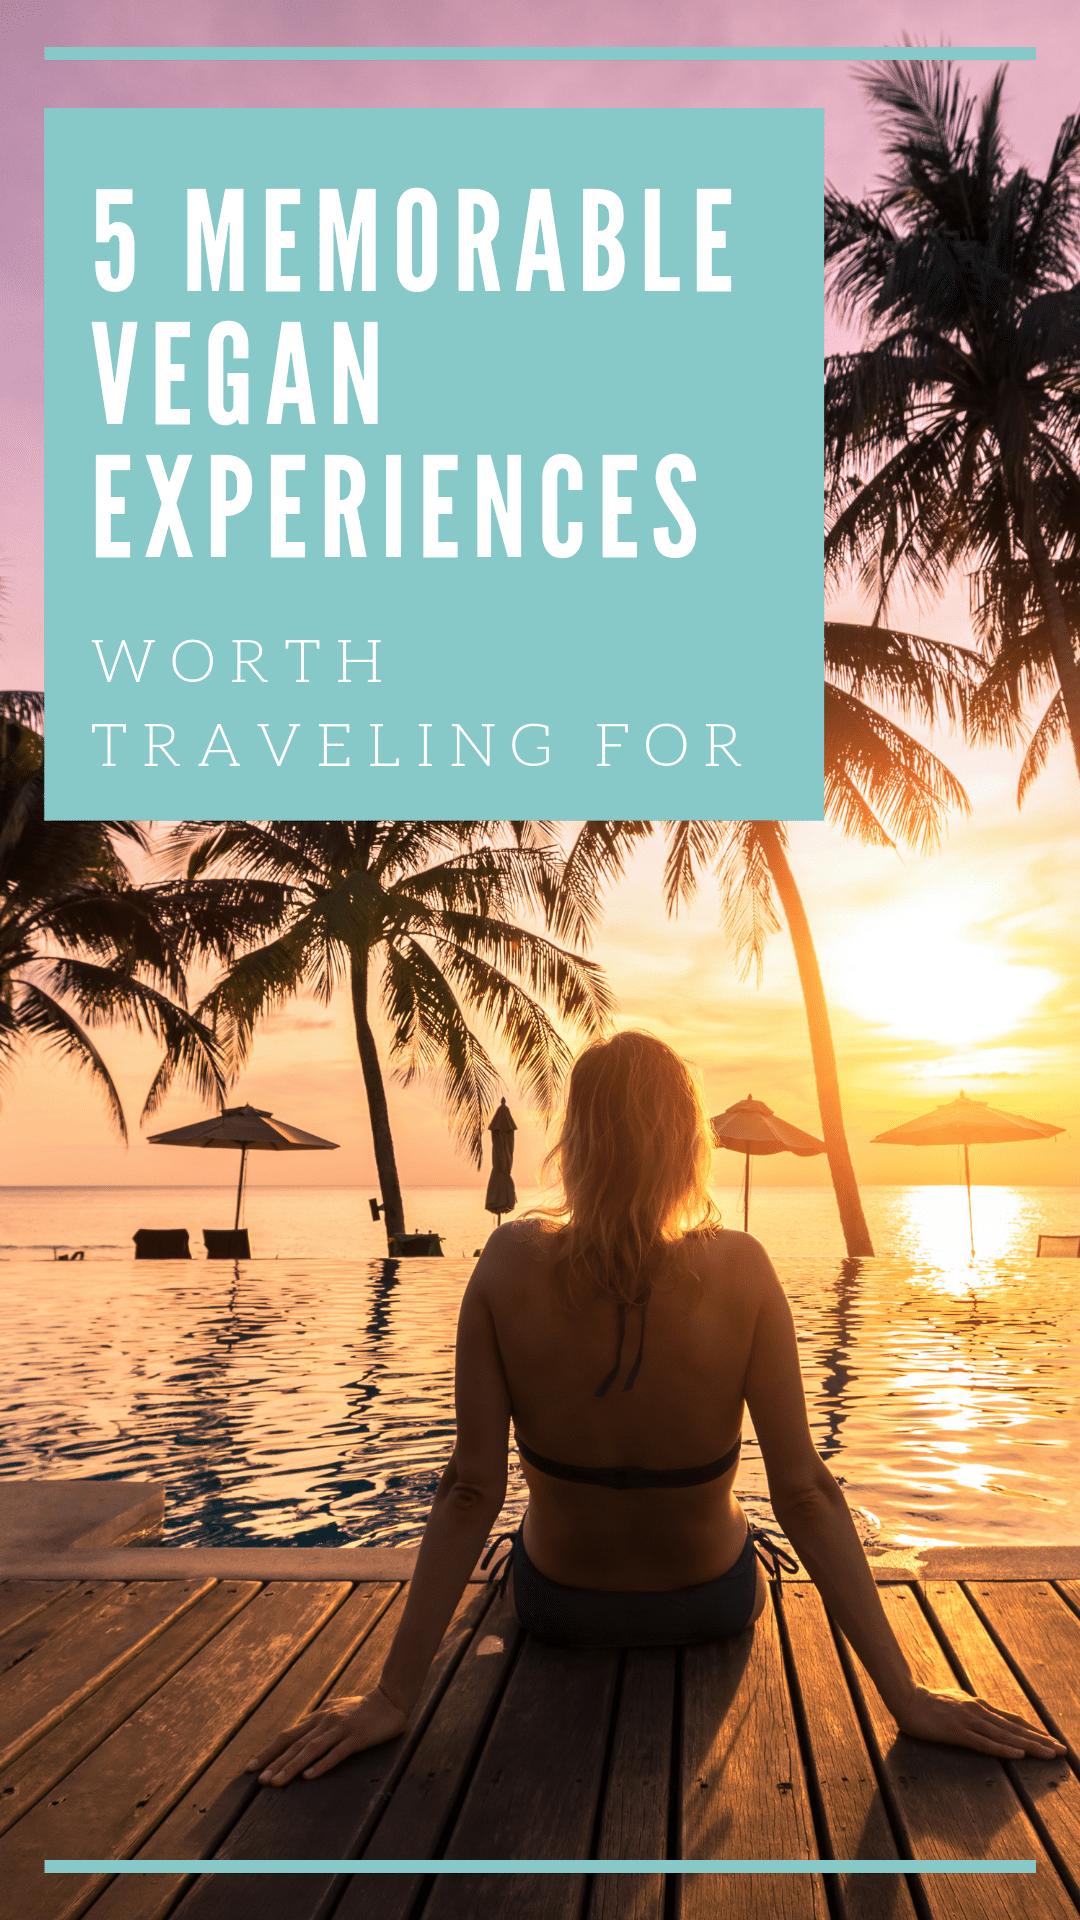 5 Memorable Vegan Experiences Worth Traveling For